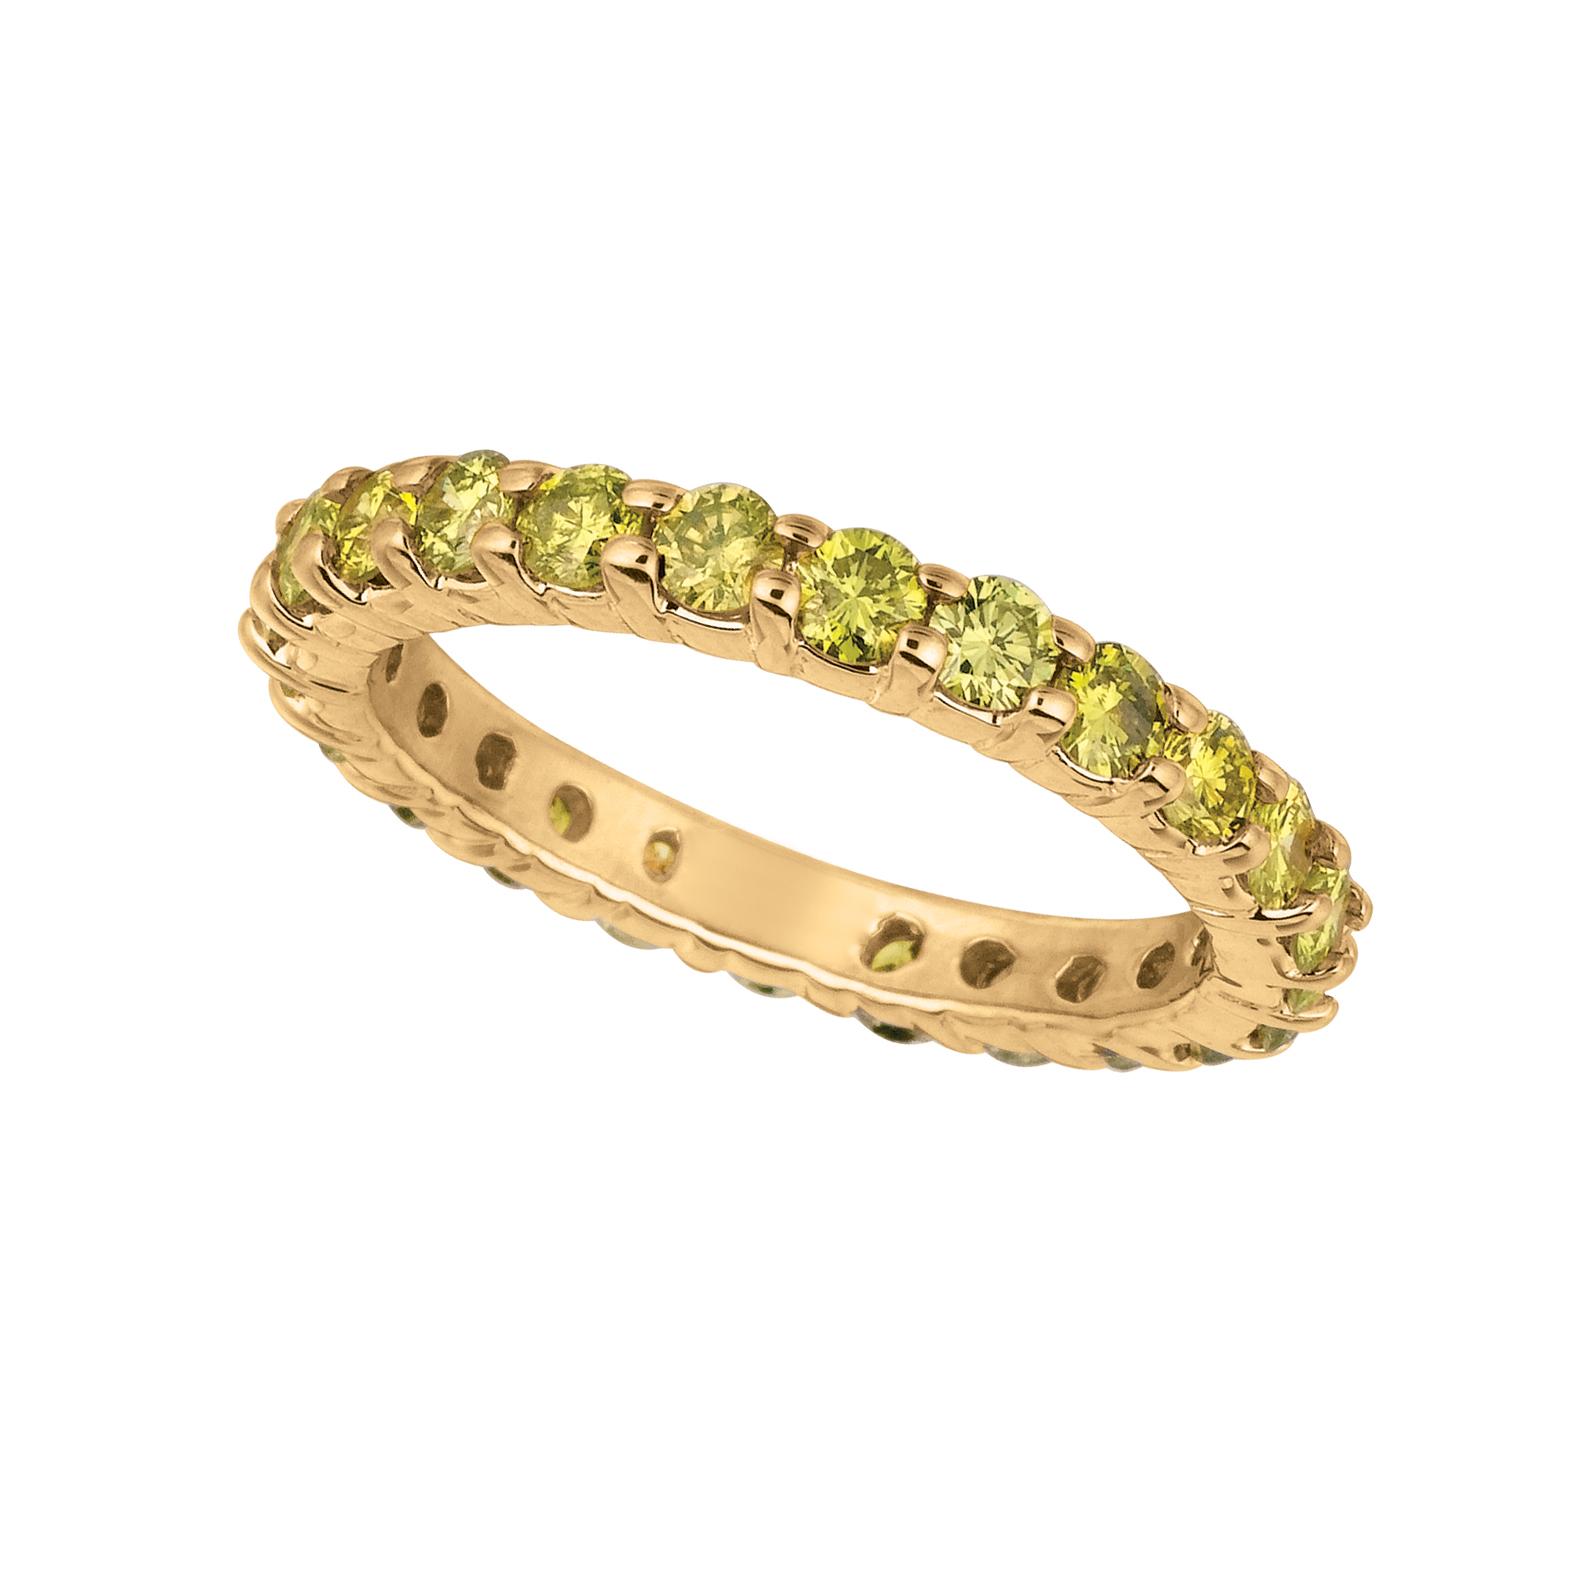 Yellow diamond eternity band. Price: $2694.00